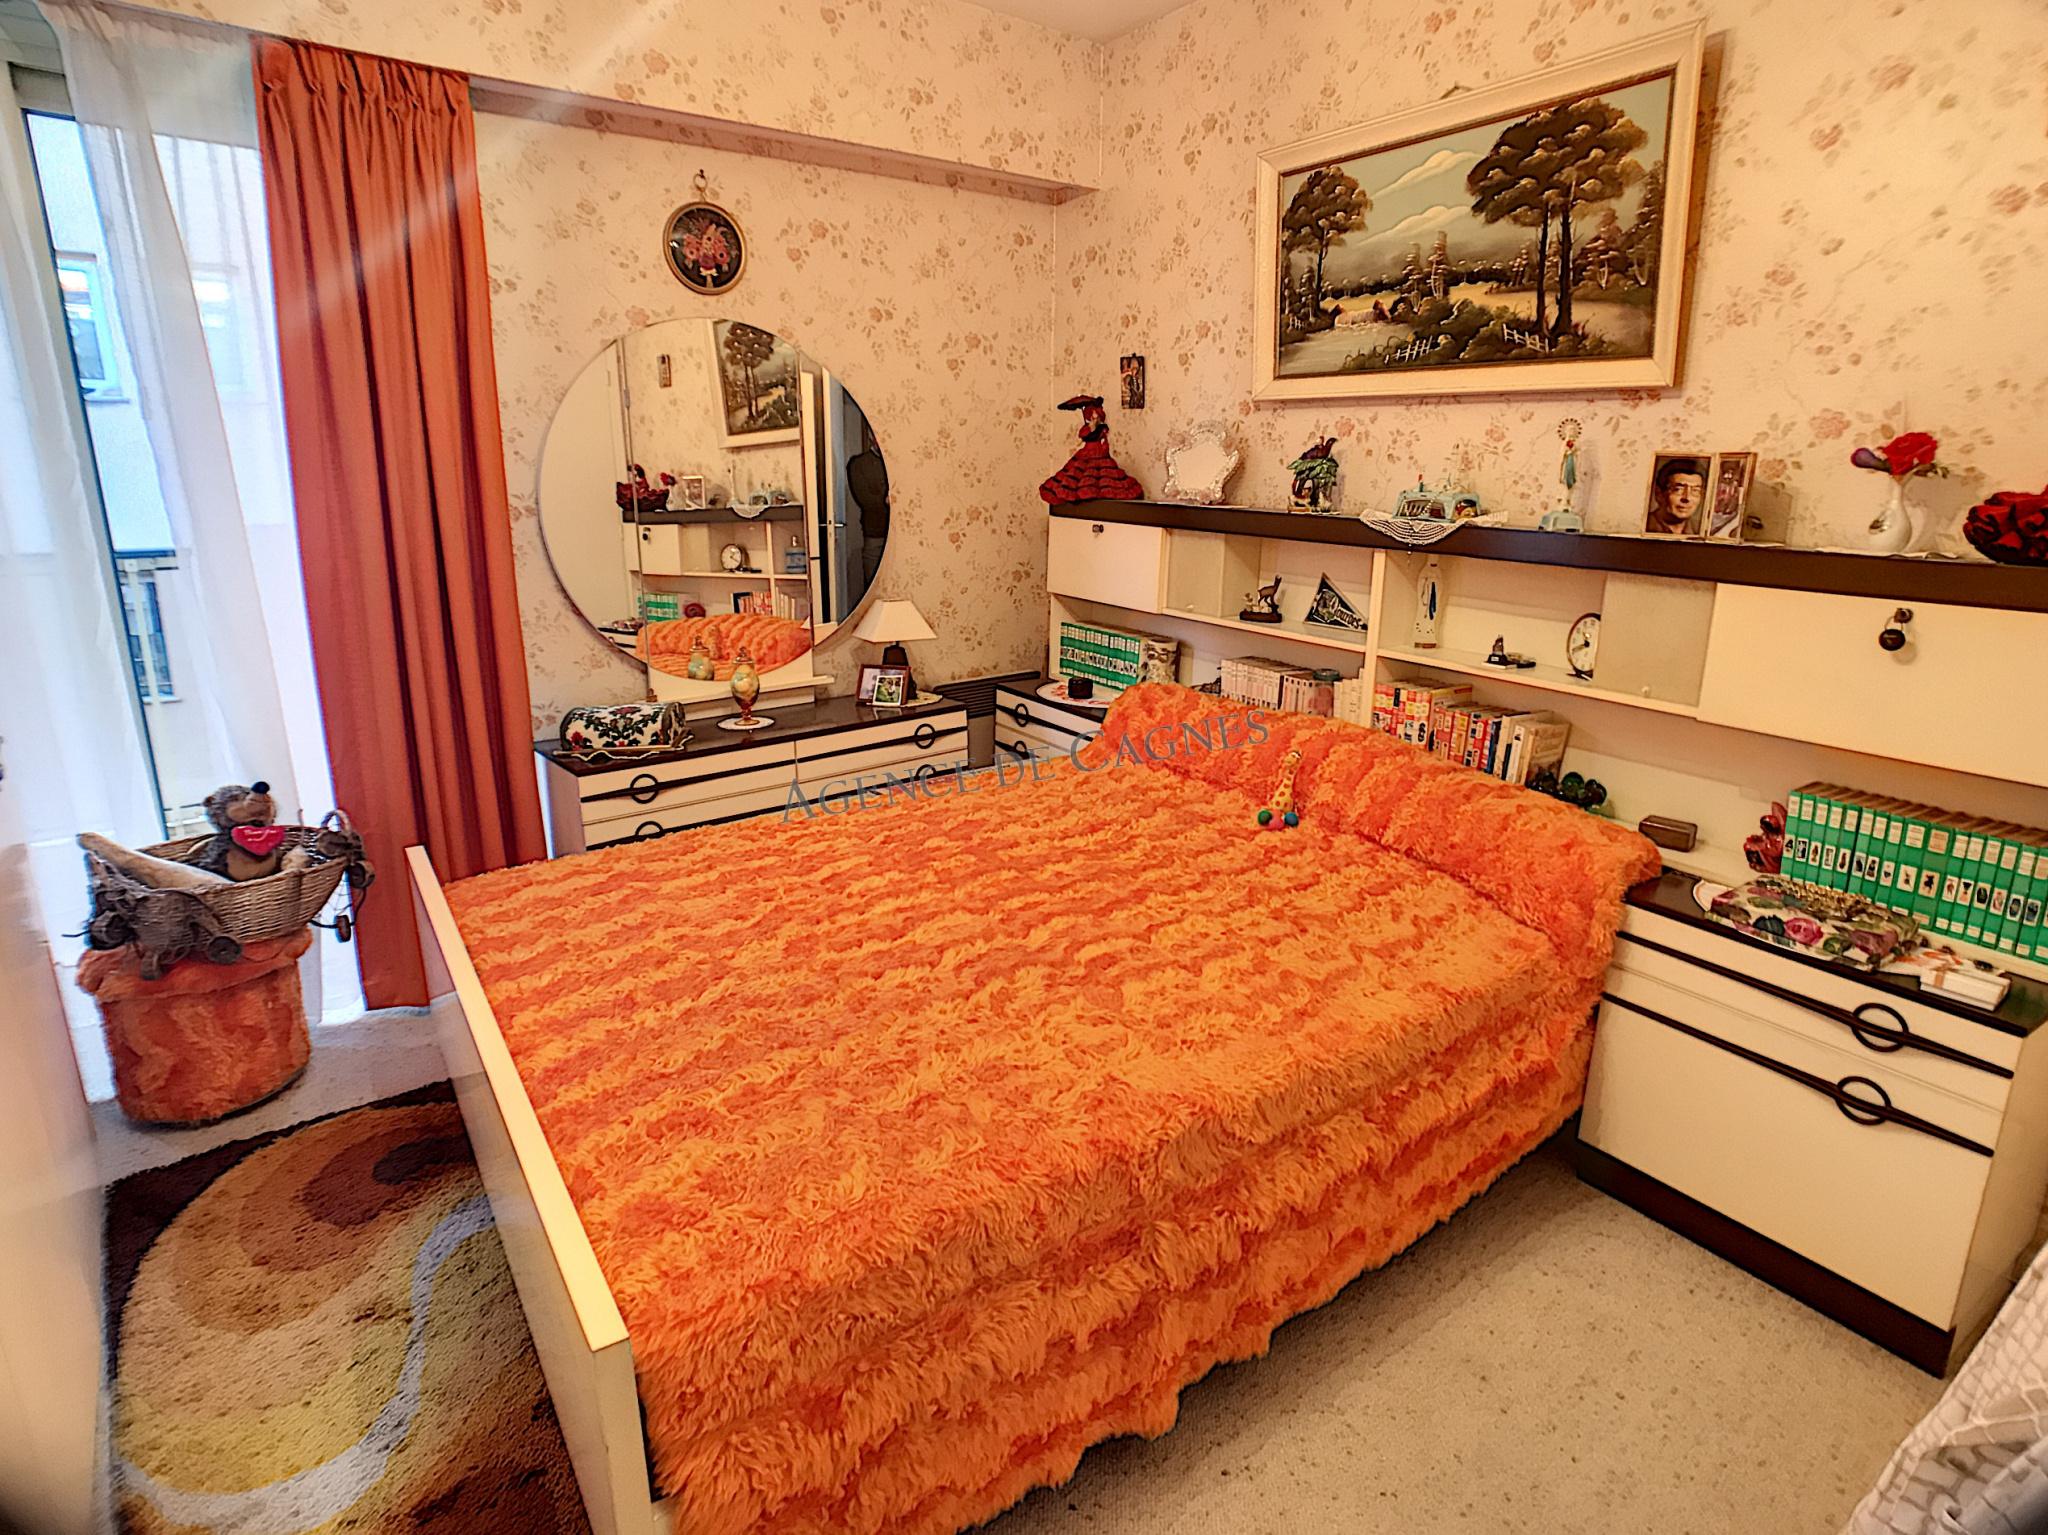 vente viager occupe cagnes sur mer 3 4 pi ces dernier tage garage agence de cagnes. Black Bedroom Furniture Sets. Home Design Ideas